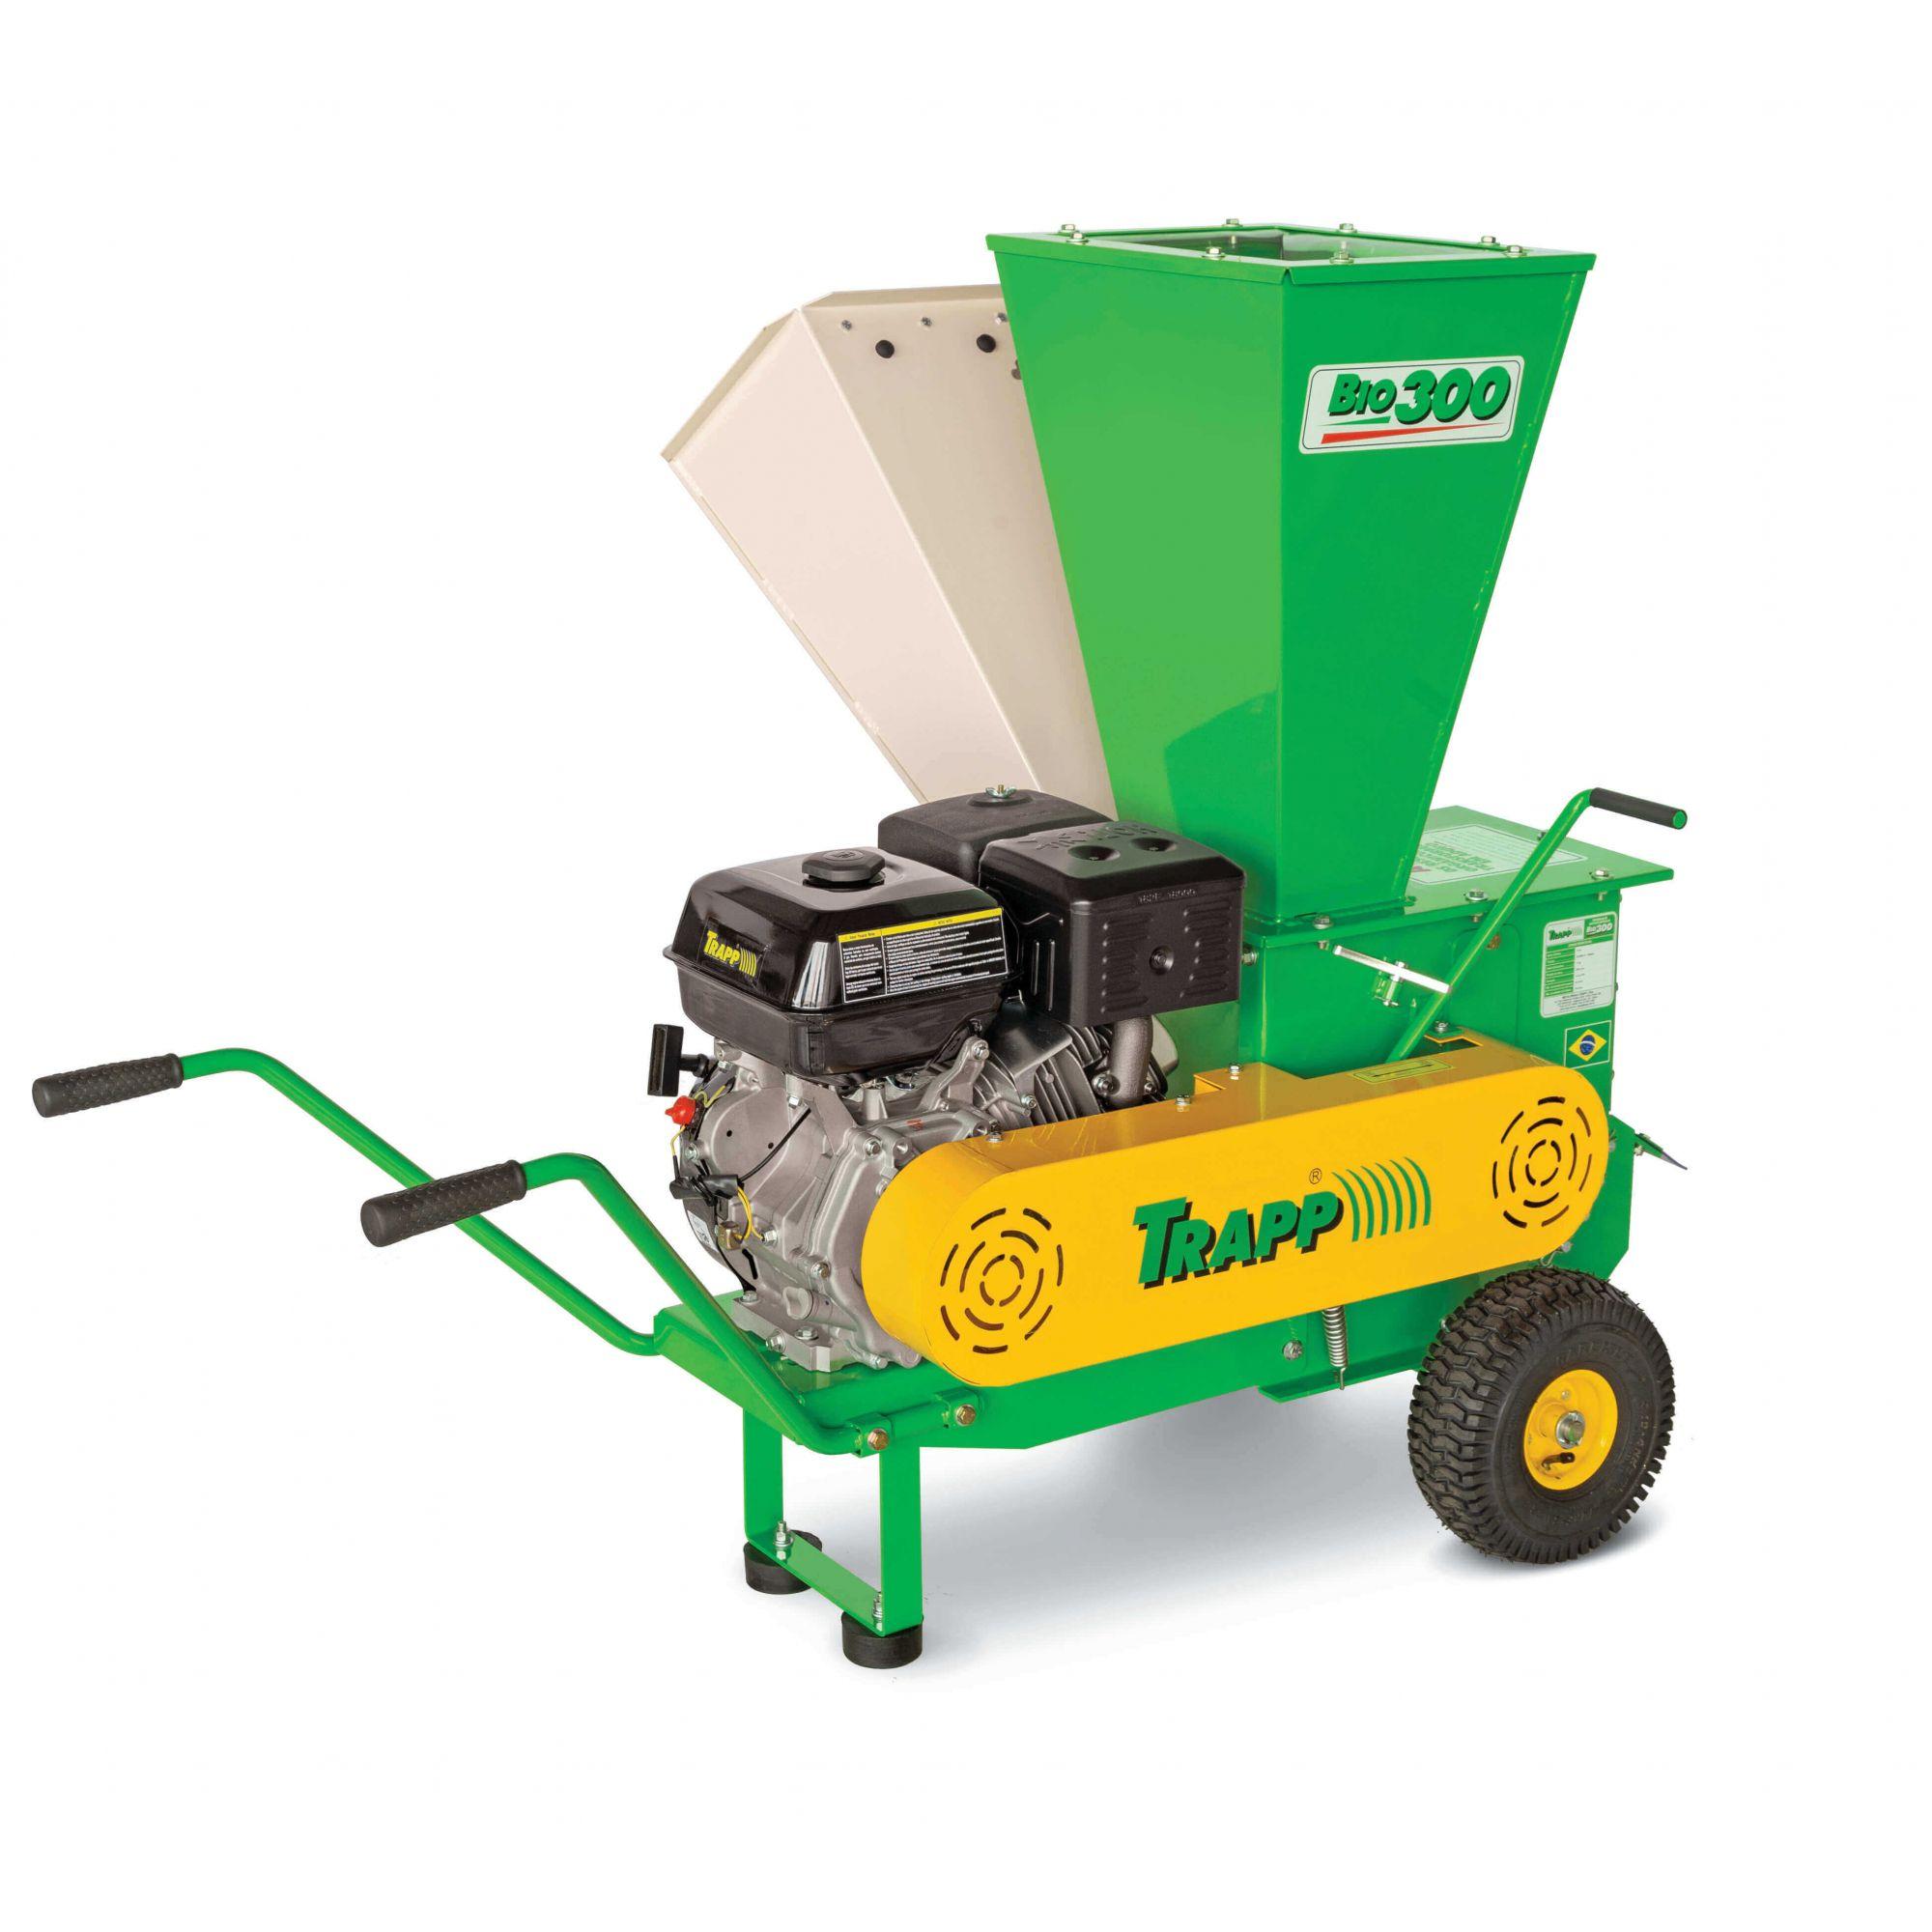 Triturador de Galhos/Resíduos Orgânicos a Gasolina 15HP BIO300 Trapp